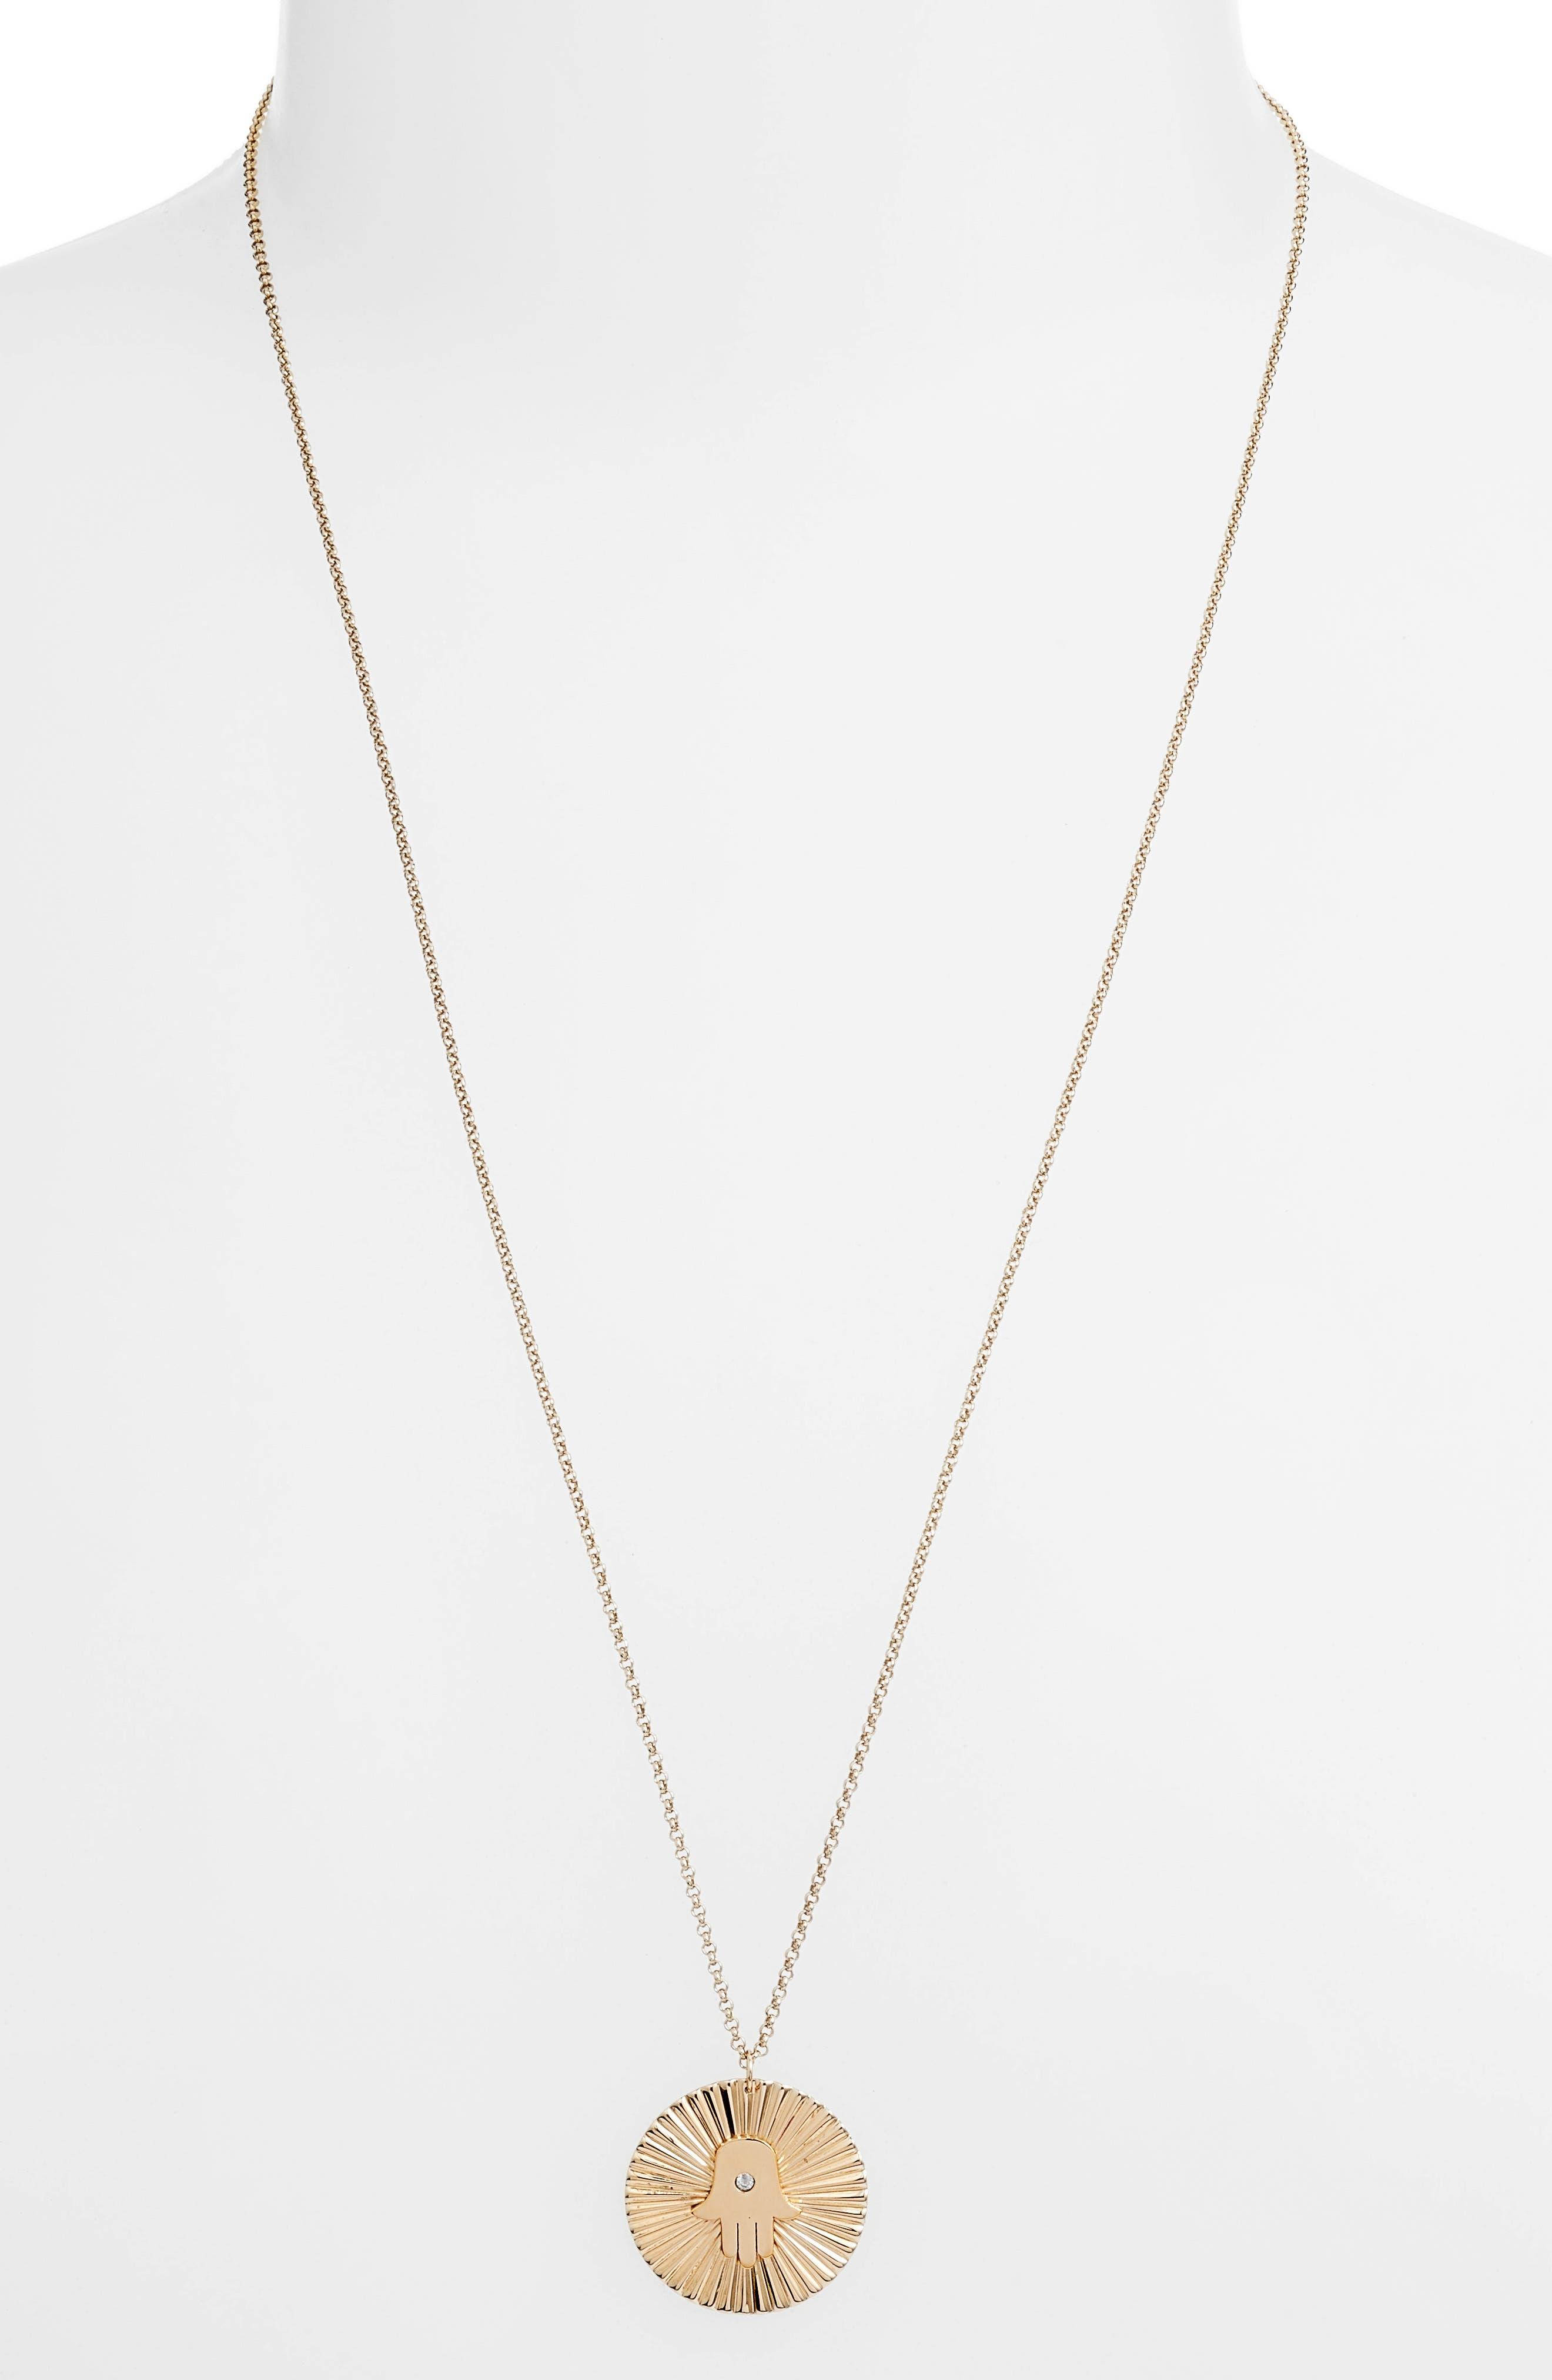 Iris Faith Diamond Pendant Necklace,                             Main thumbnail 1, color,                             YELLOW VERMEIL